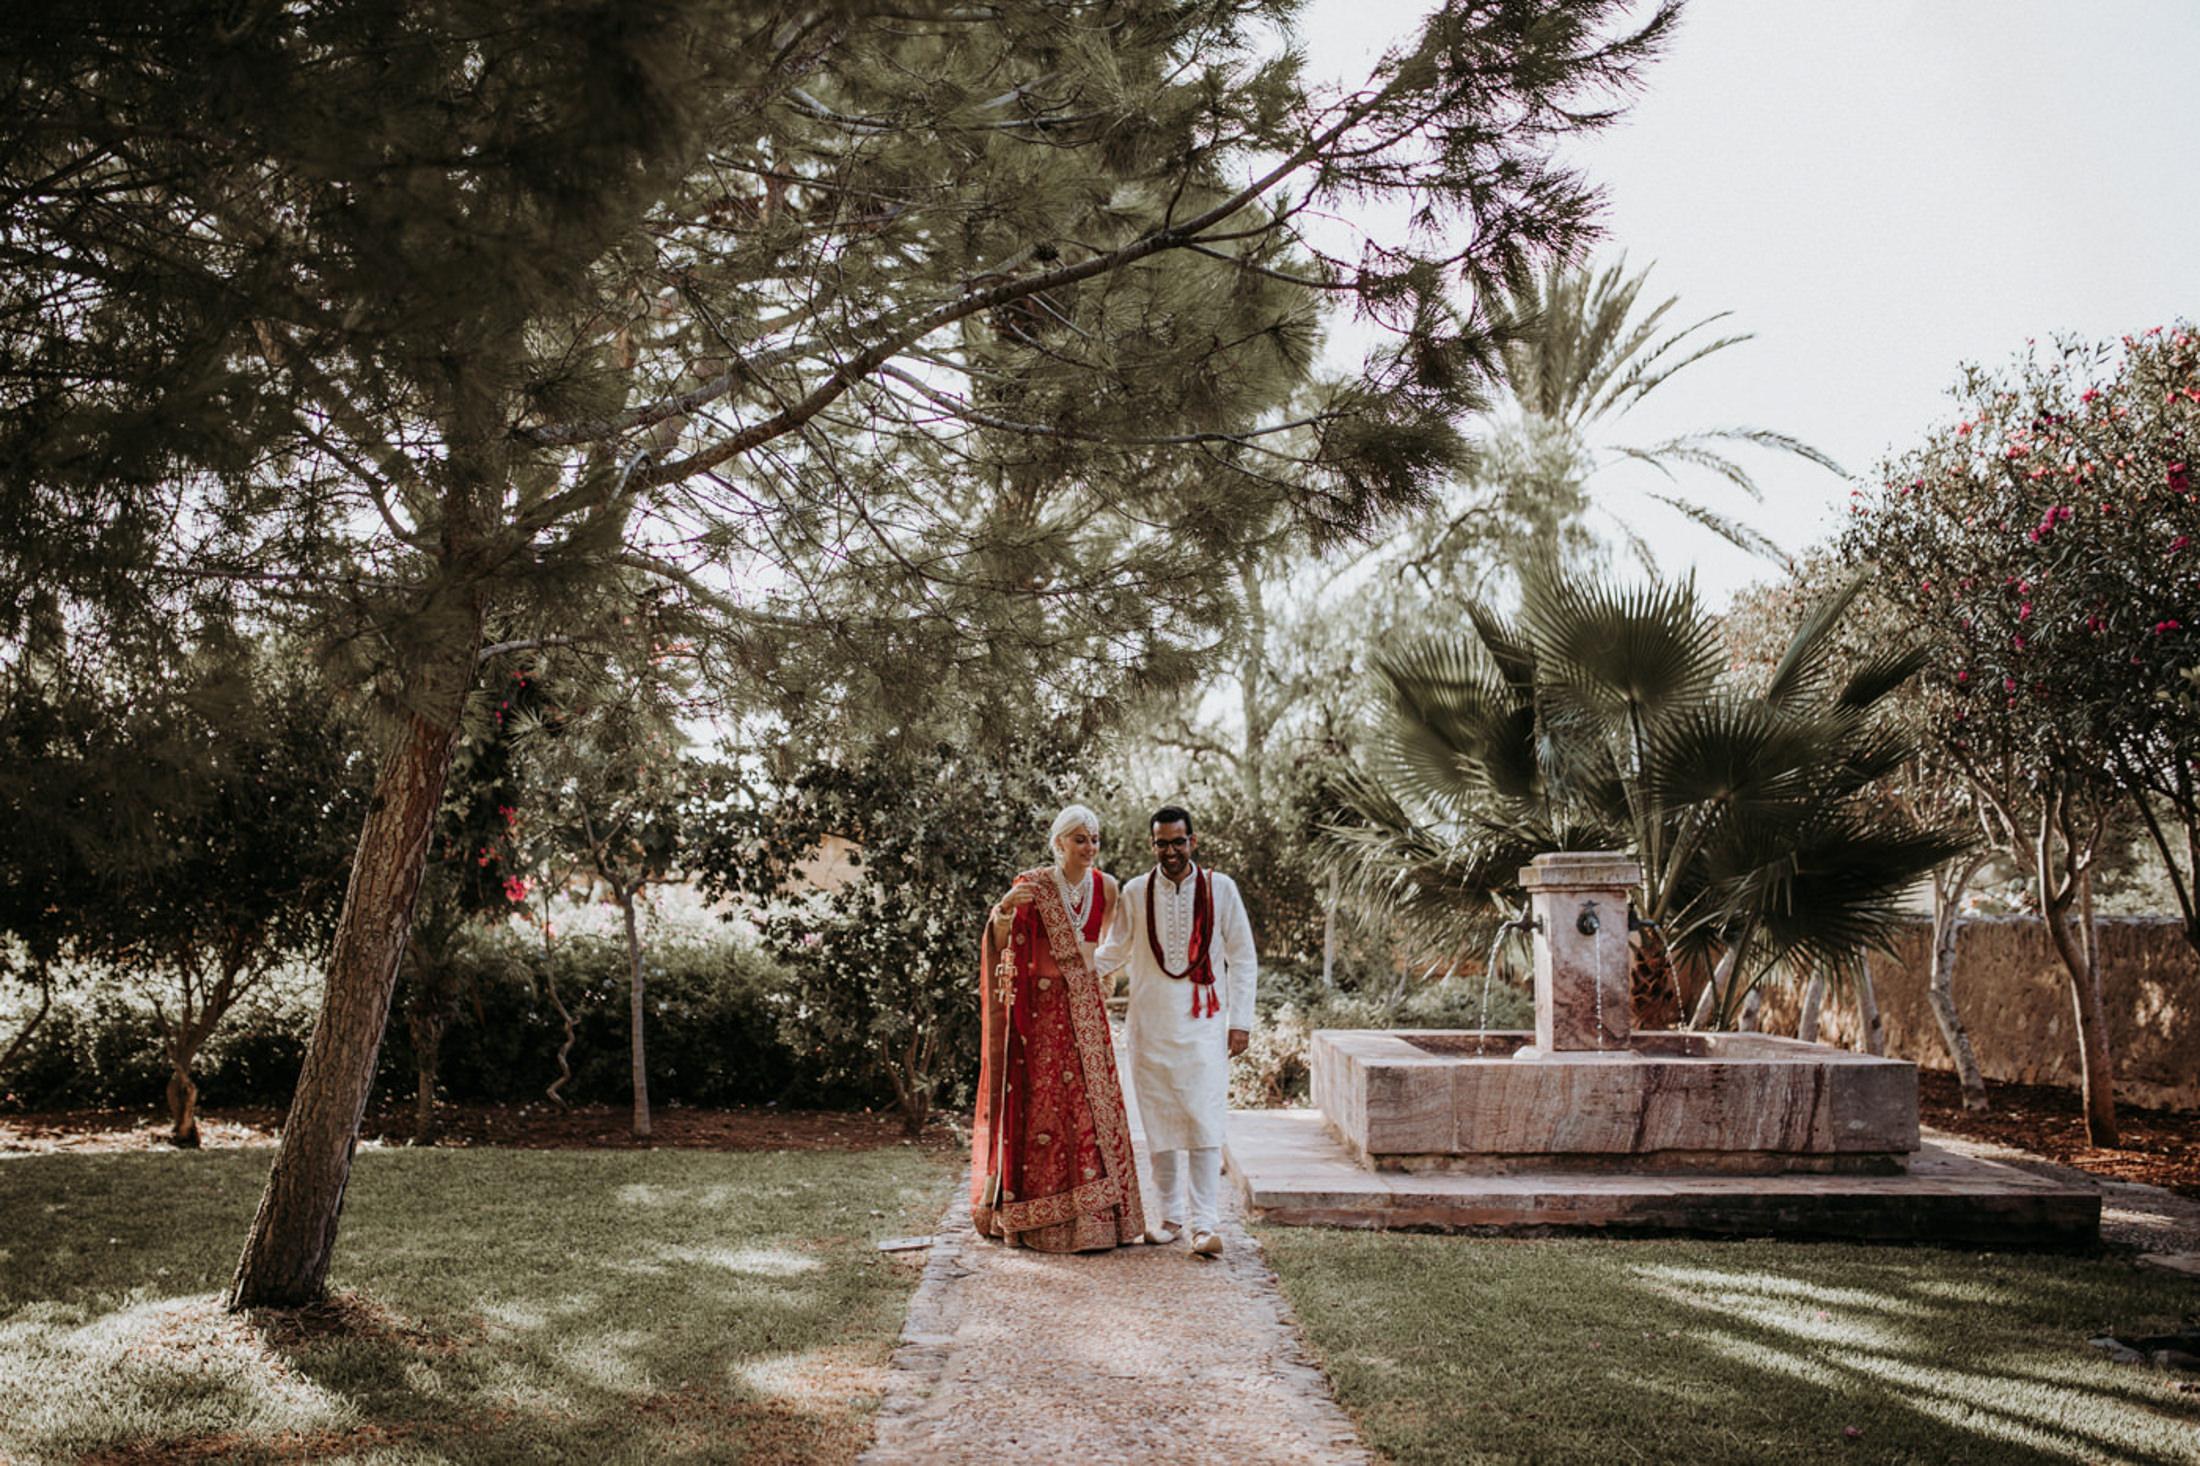 Wedding_Photographer_Mallorca_Daniela-Marquardt_Photography_New_York_Iceland_Tuscany_Santorini_Portugal_Austria_Bavaria_Elopement_Hochzeitsfotograf_AntjeRajat2_58